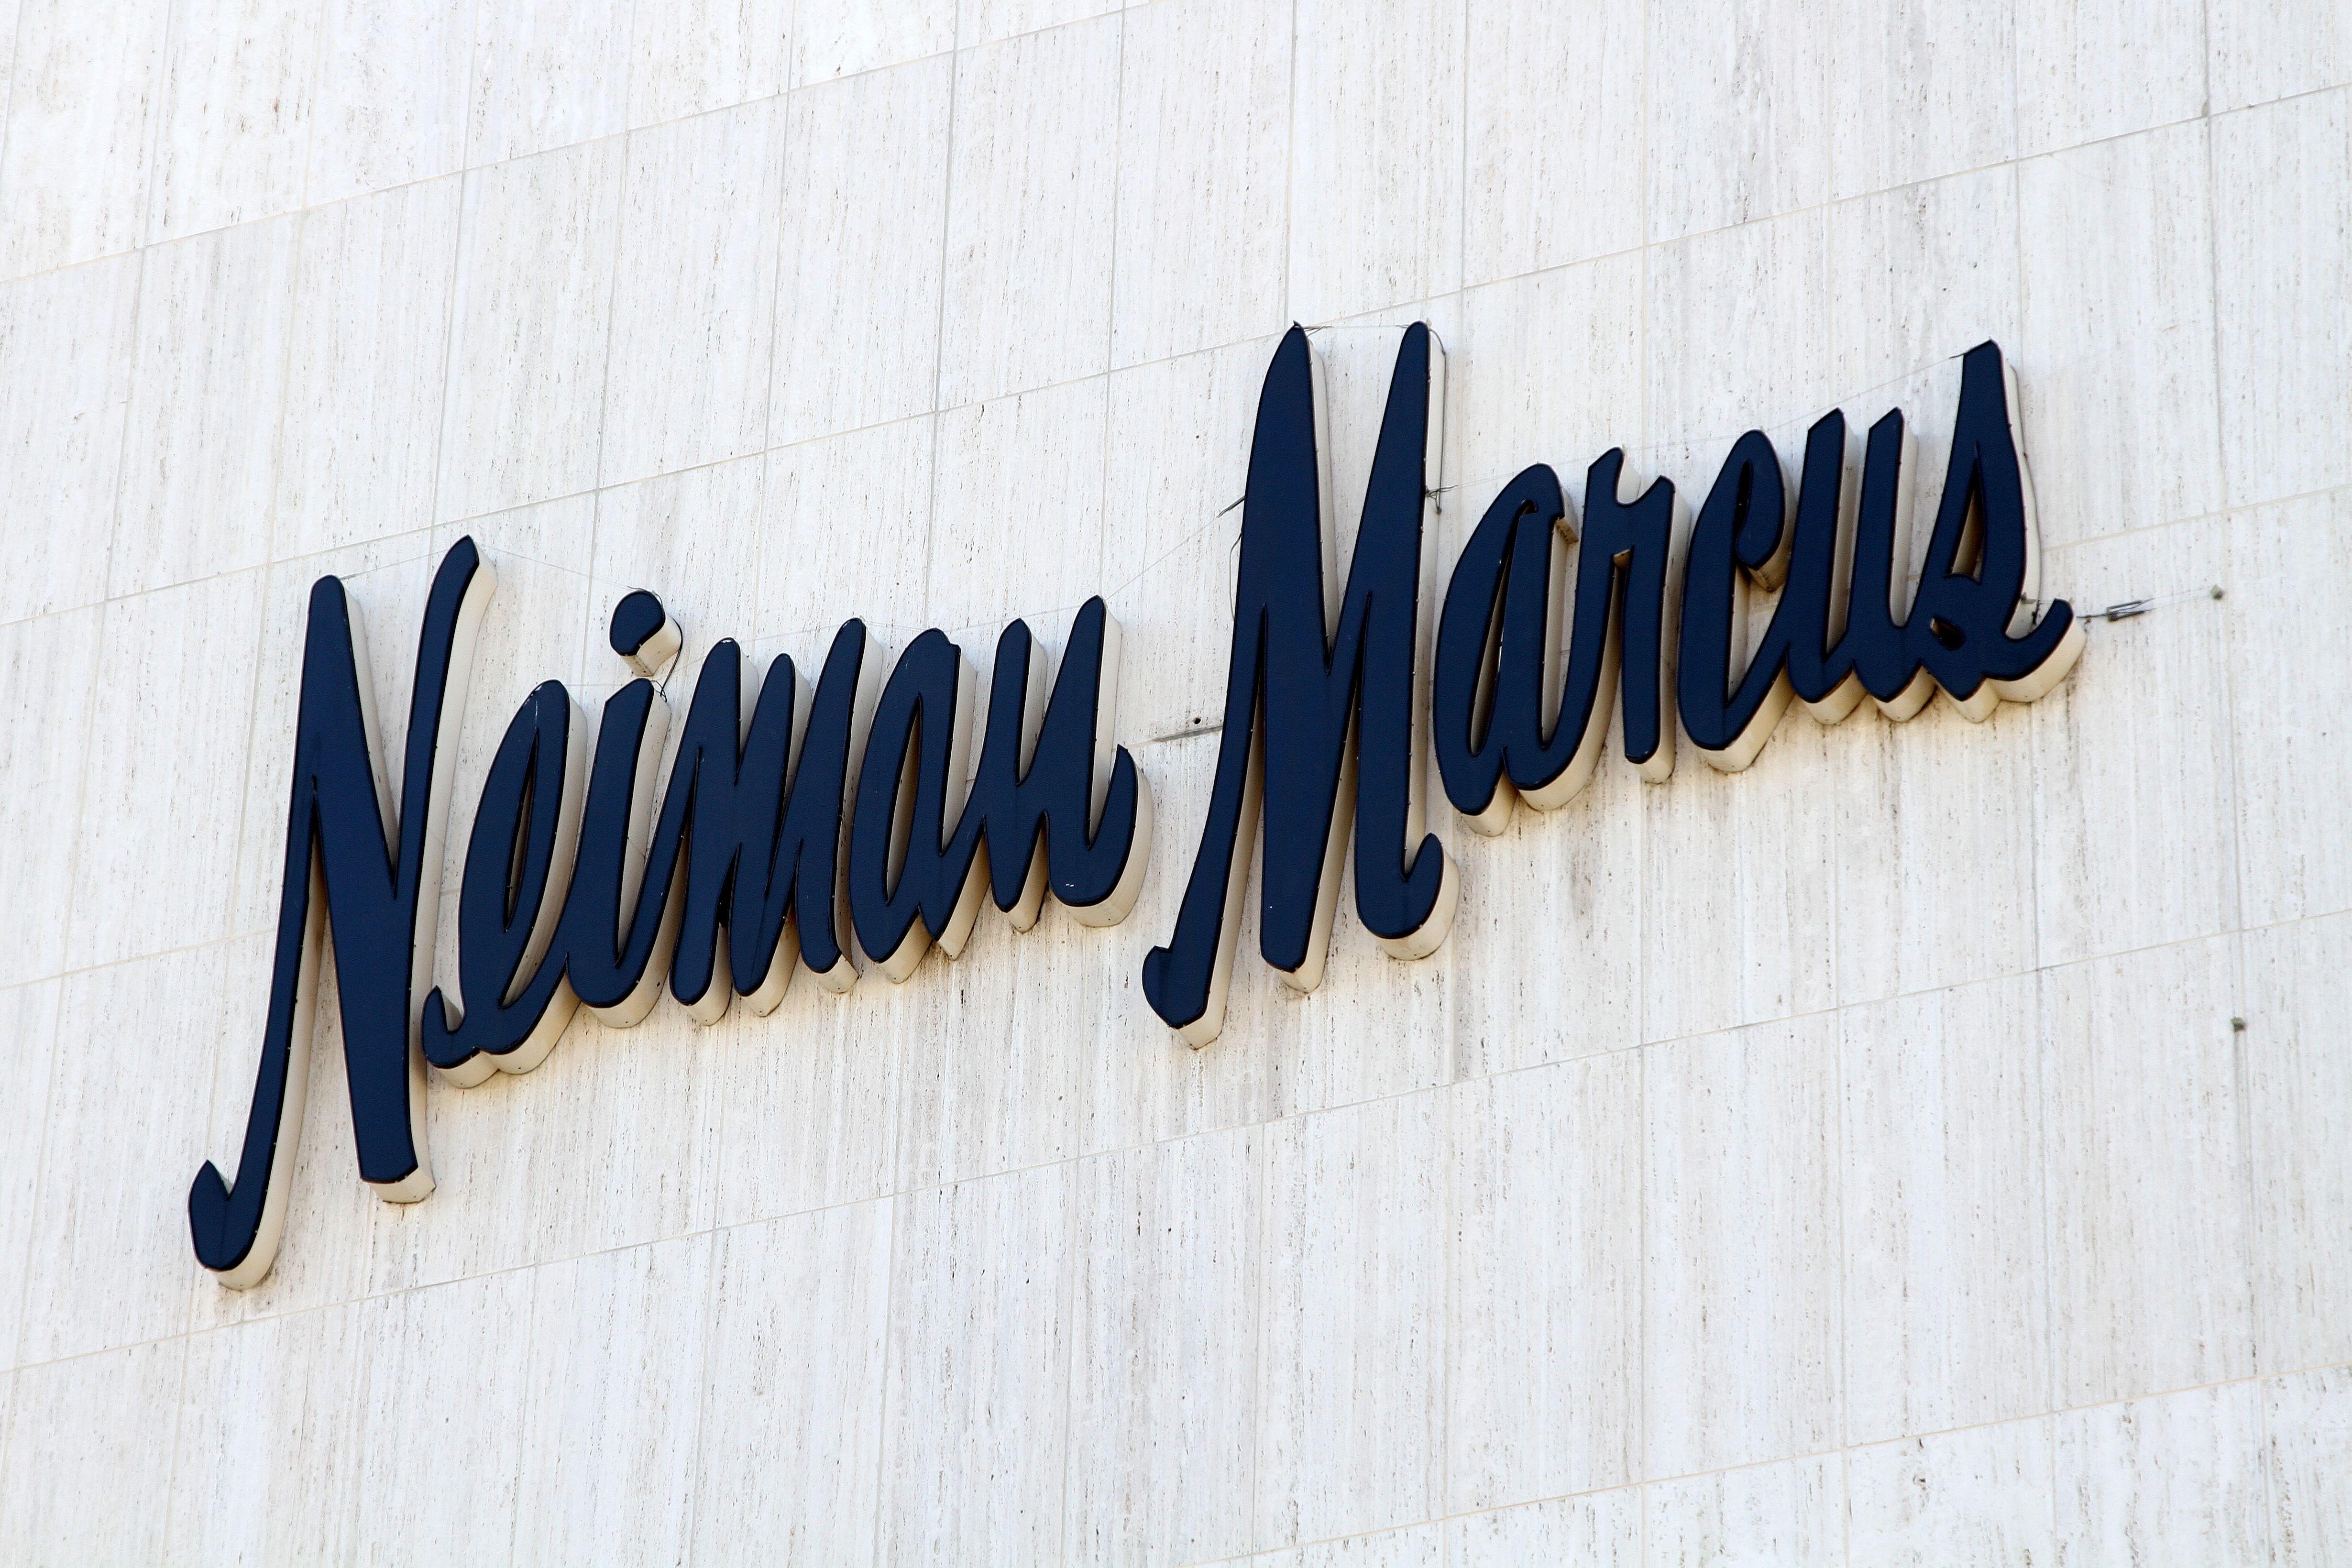 Neiman MarcusShop signs, Los Angeles, America - 04 Apr 2015